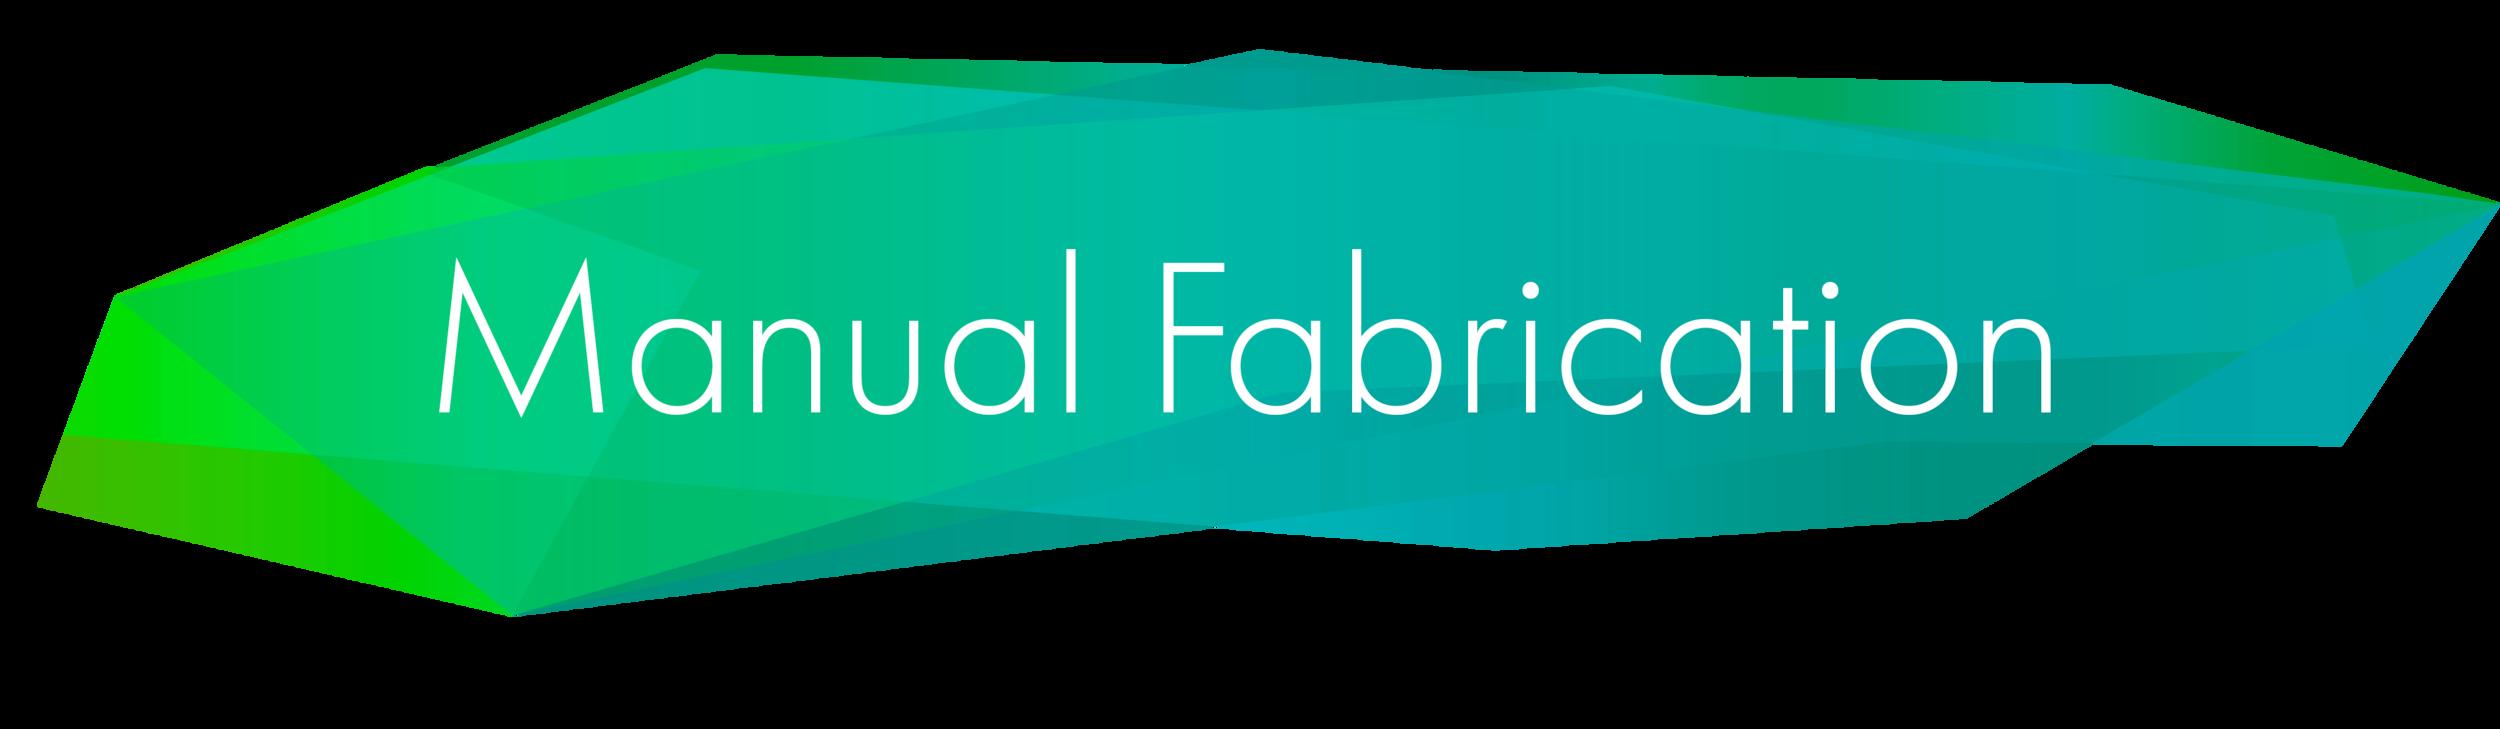 Manual fab banner2 .png